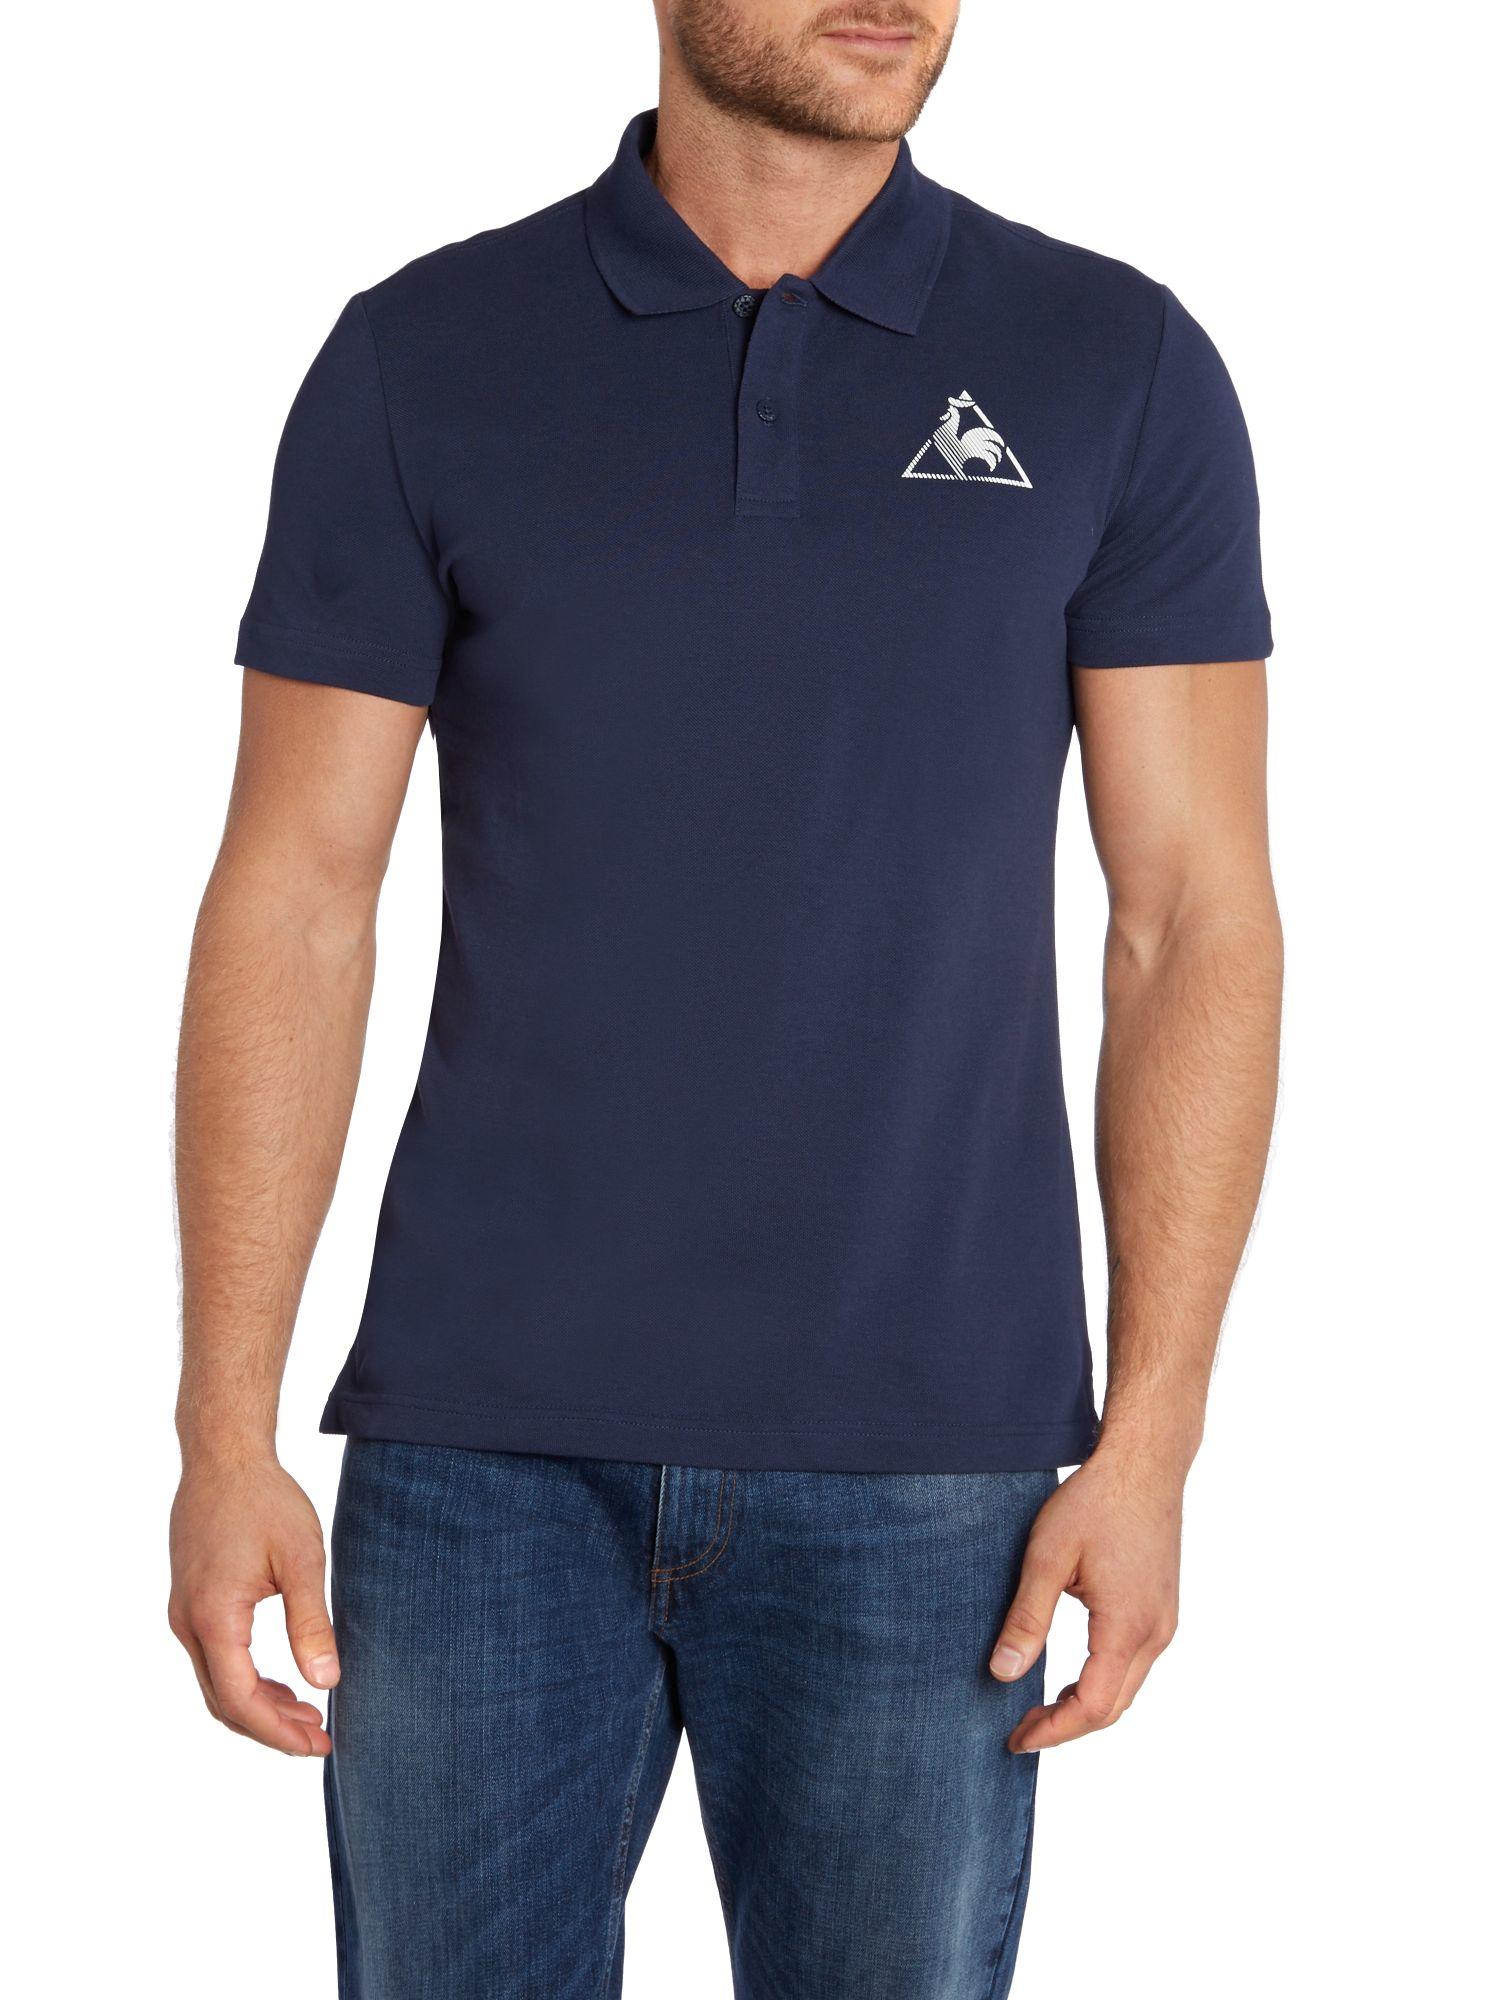 le coq sportif shirt - photo #43